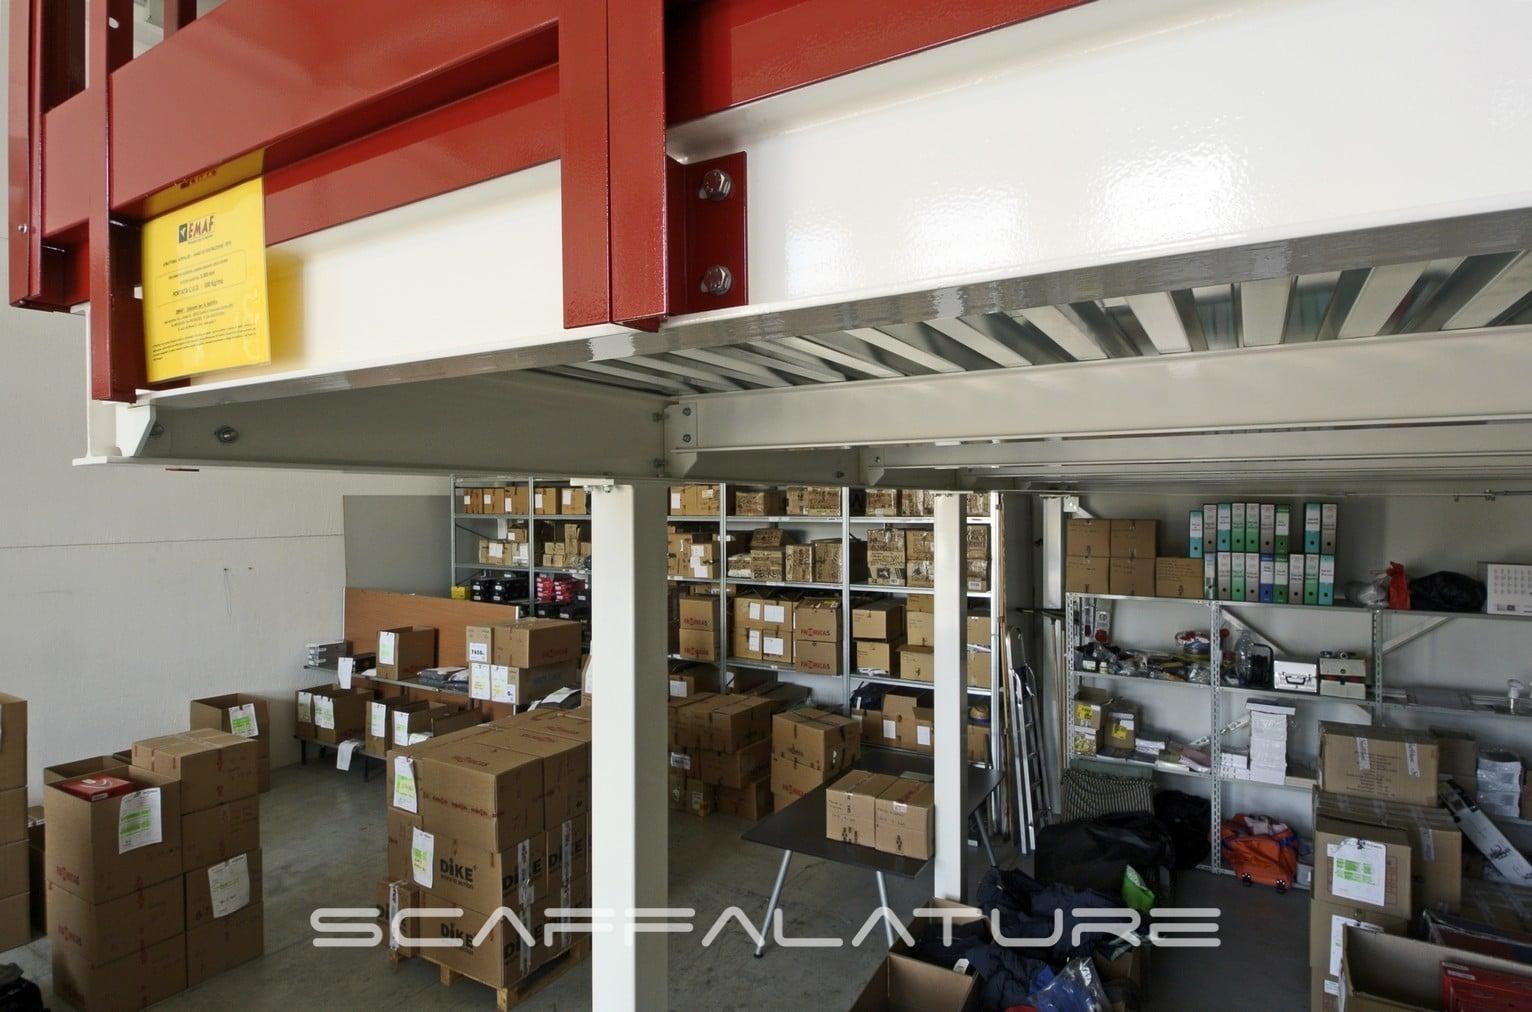 Costo Soppalco Al Mq soppalchi industriali - palladio es200 da dieci metri quadrati